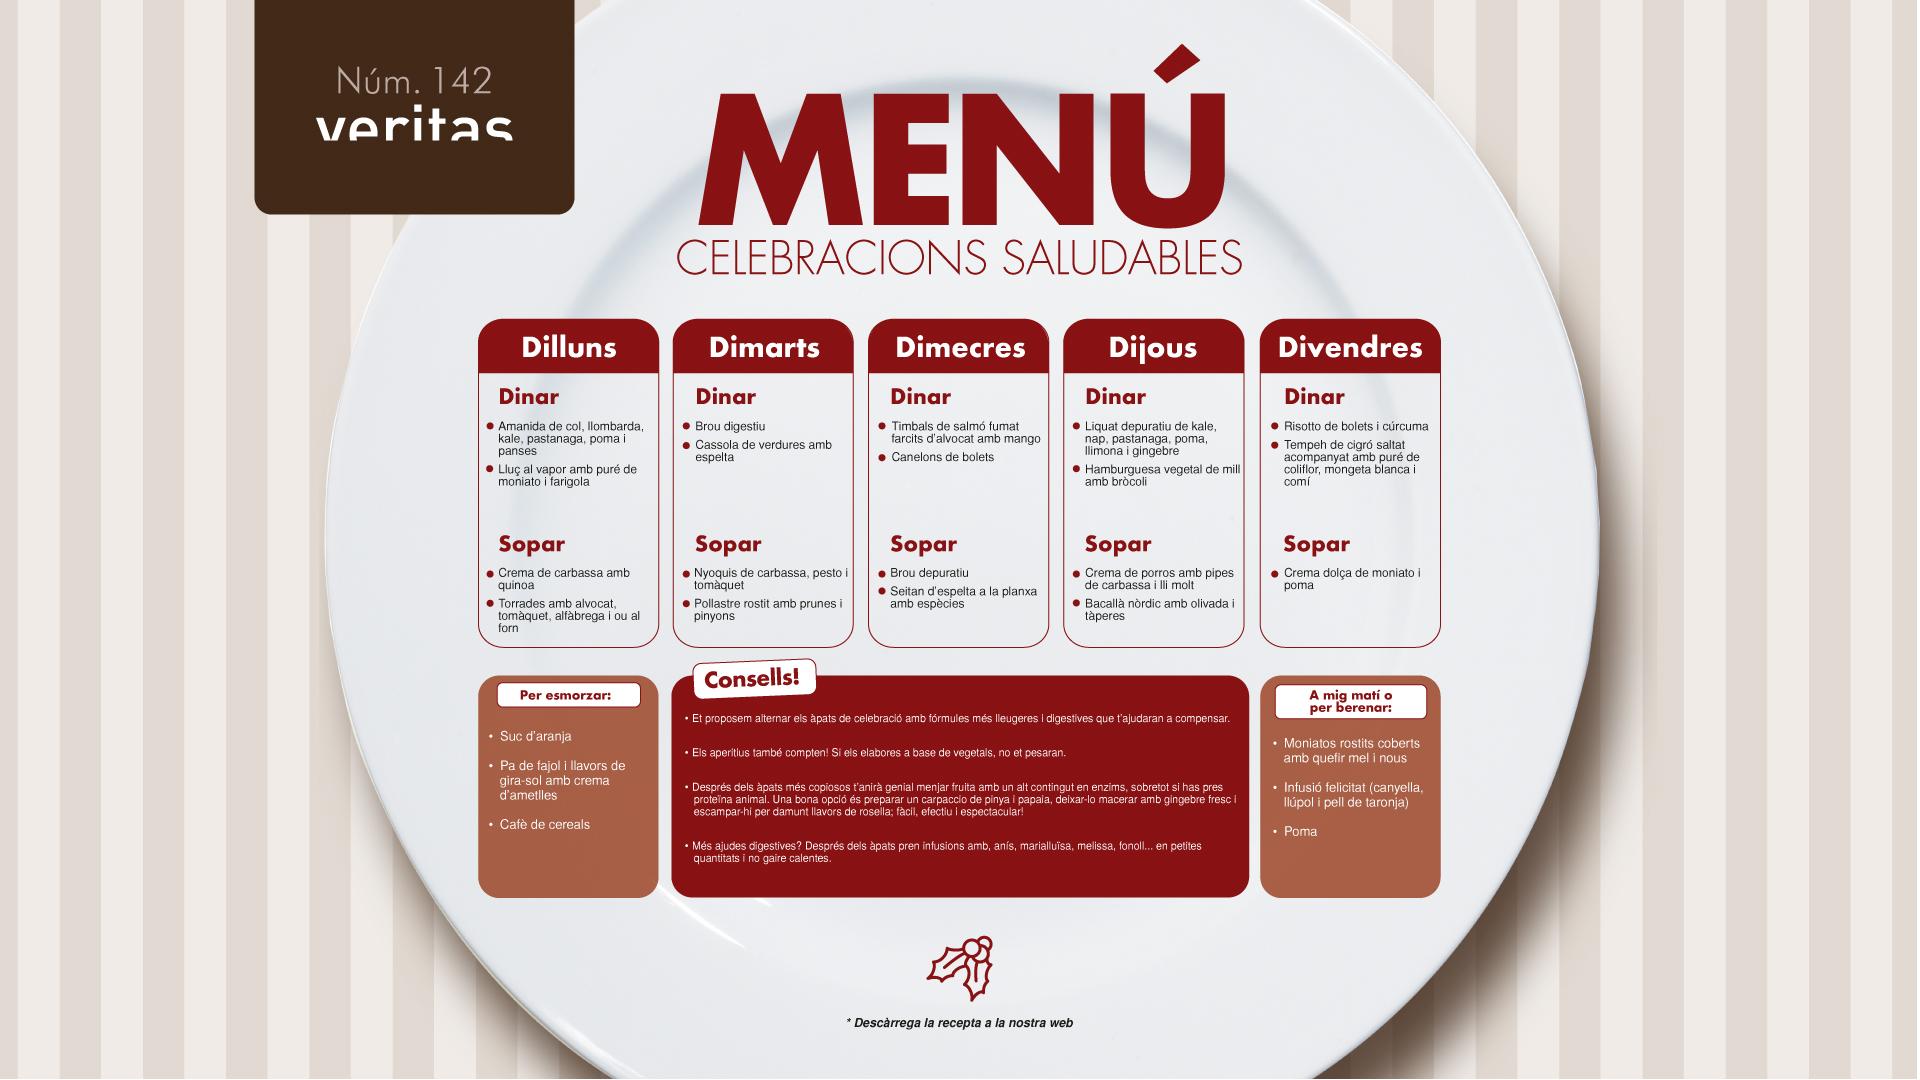 Celebracions saludables - Menú - Veritas